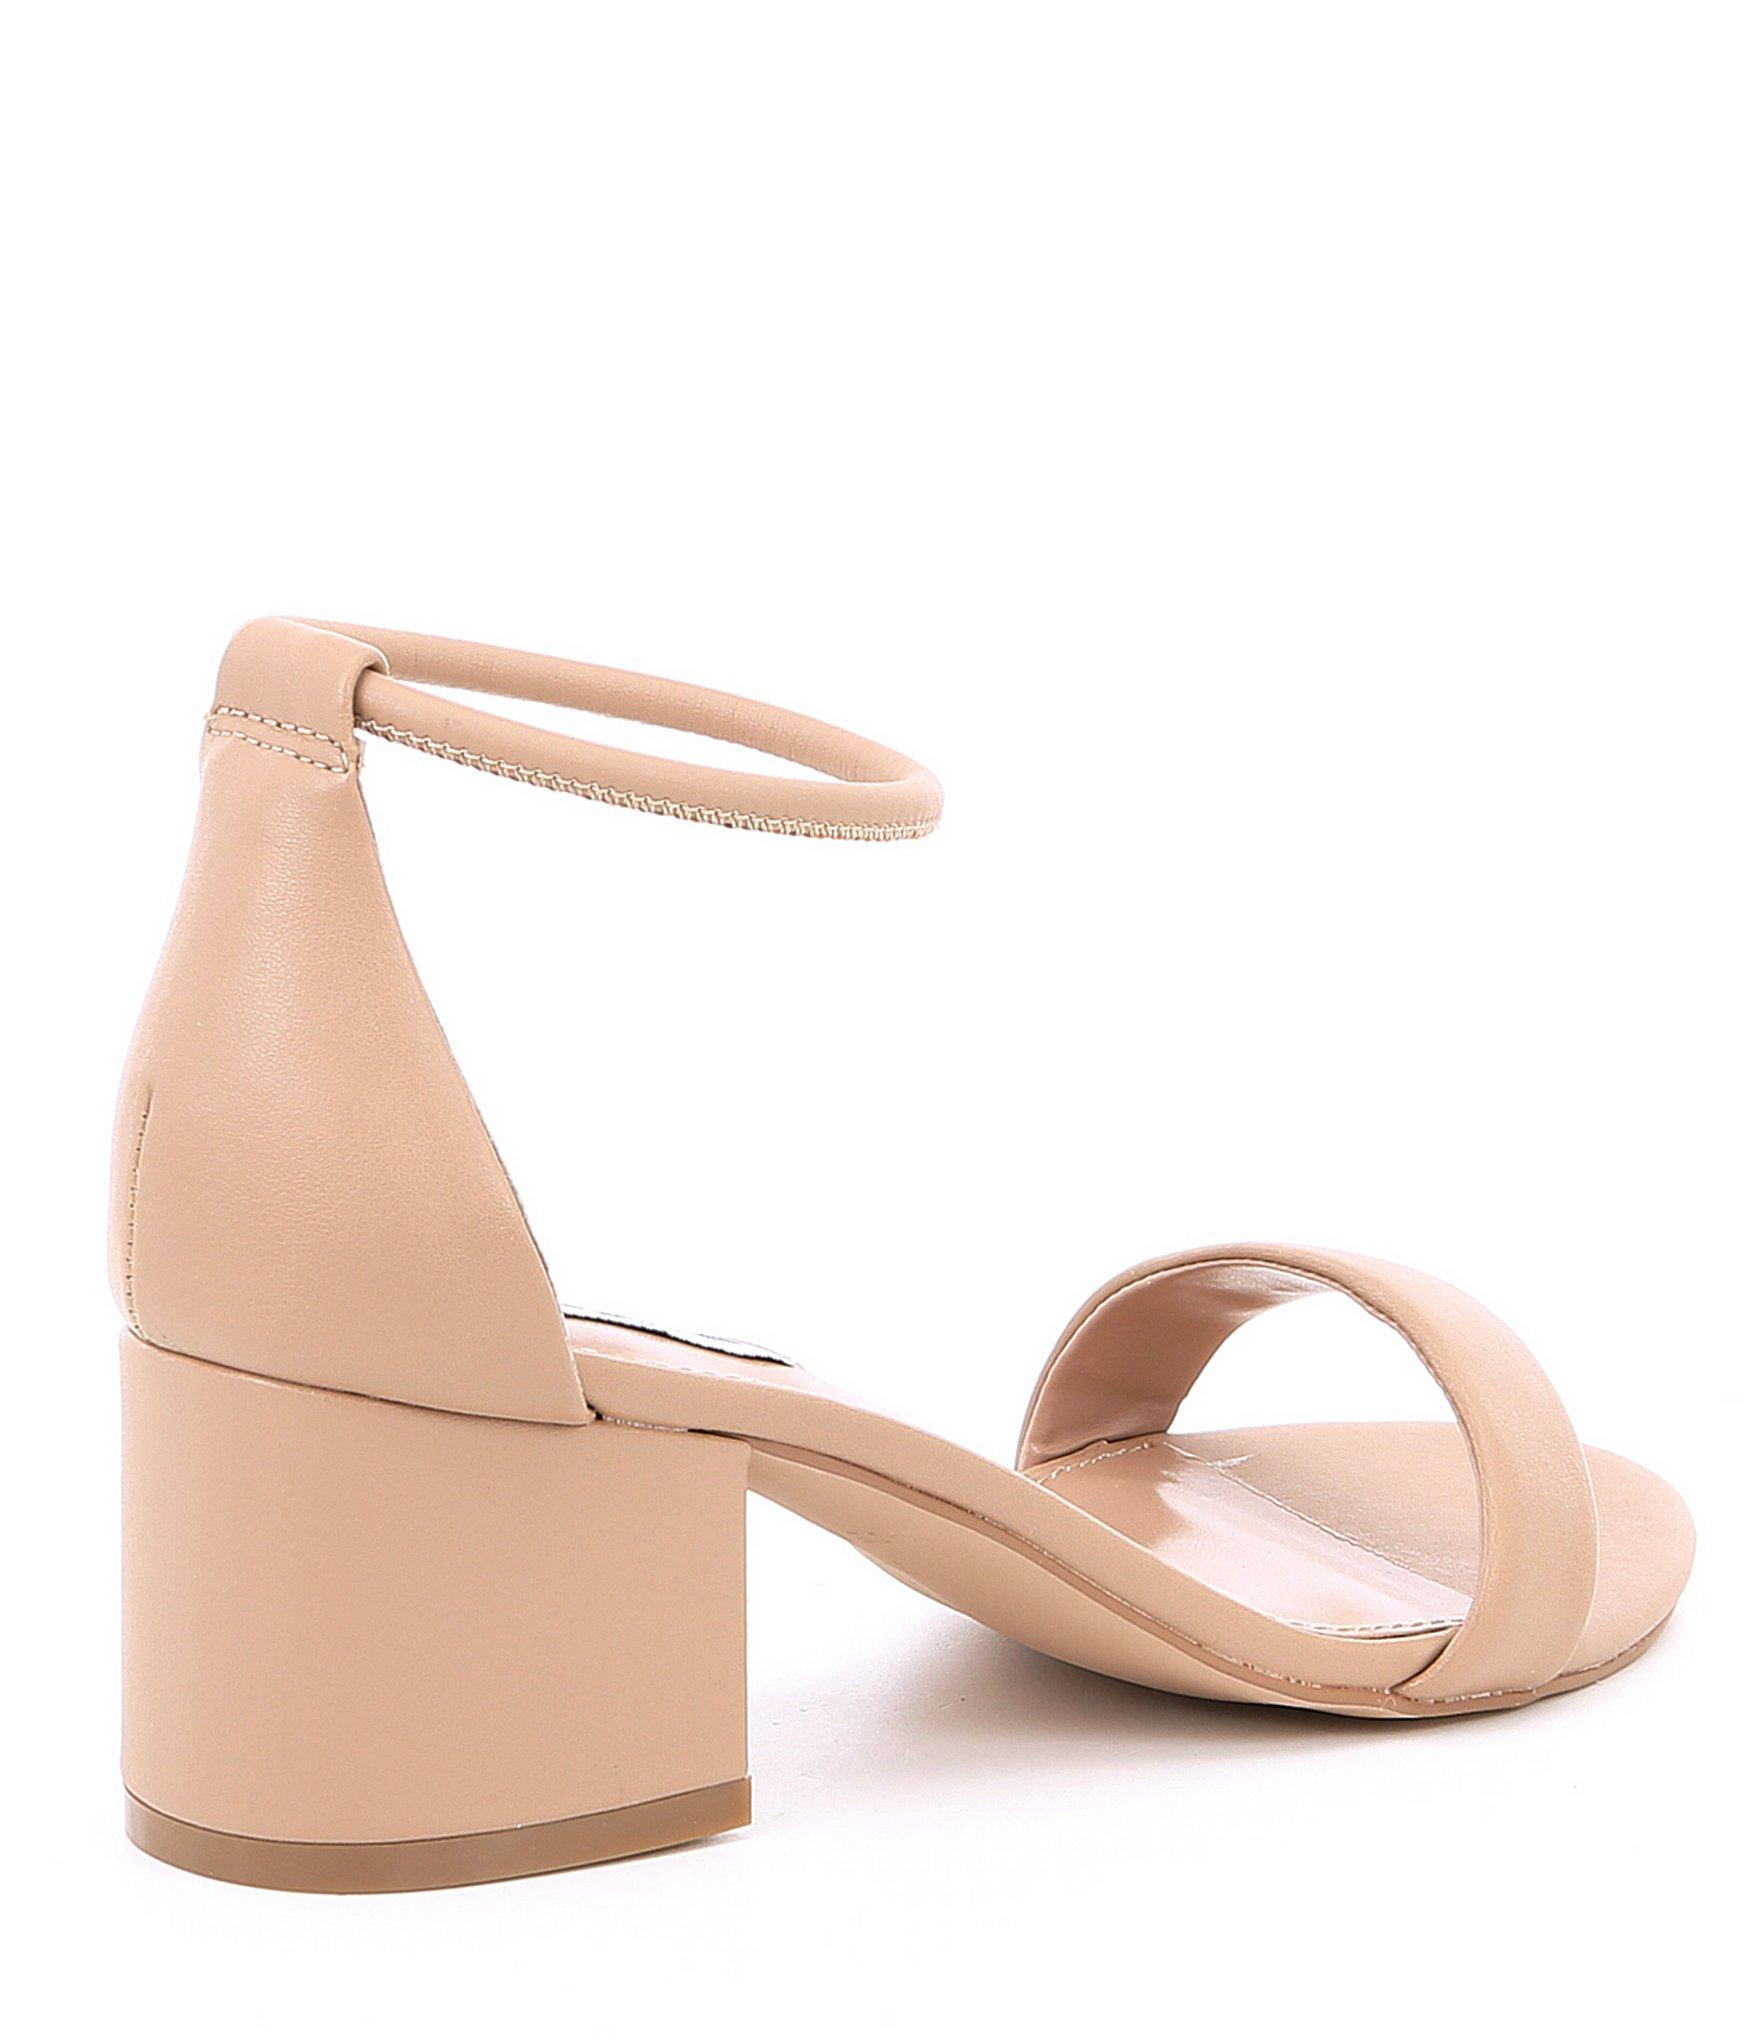 6579621eec0 Steve Madden - Natural Ibbie Block Heel Sandals - Lyst. View fullscreen